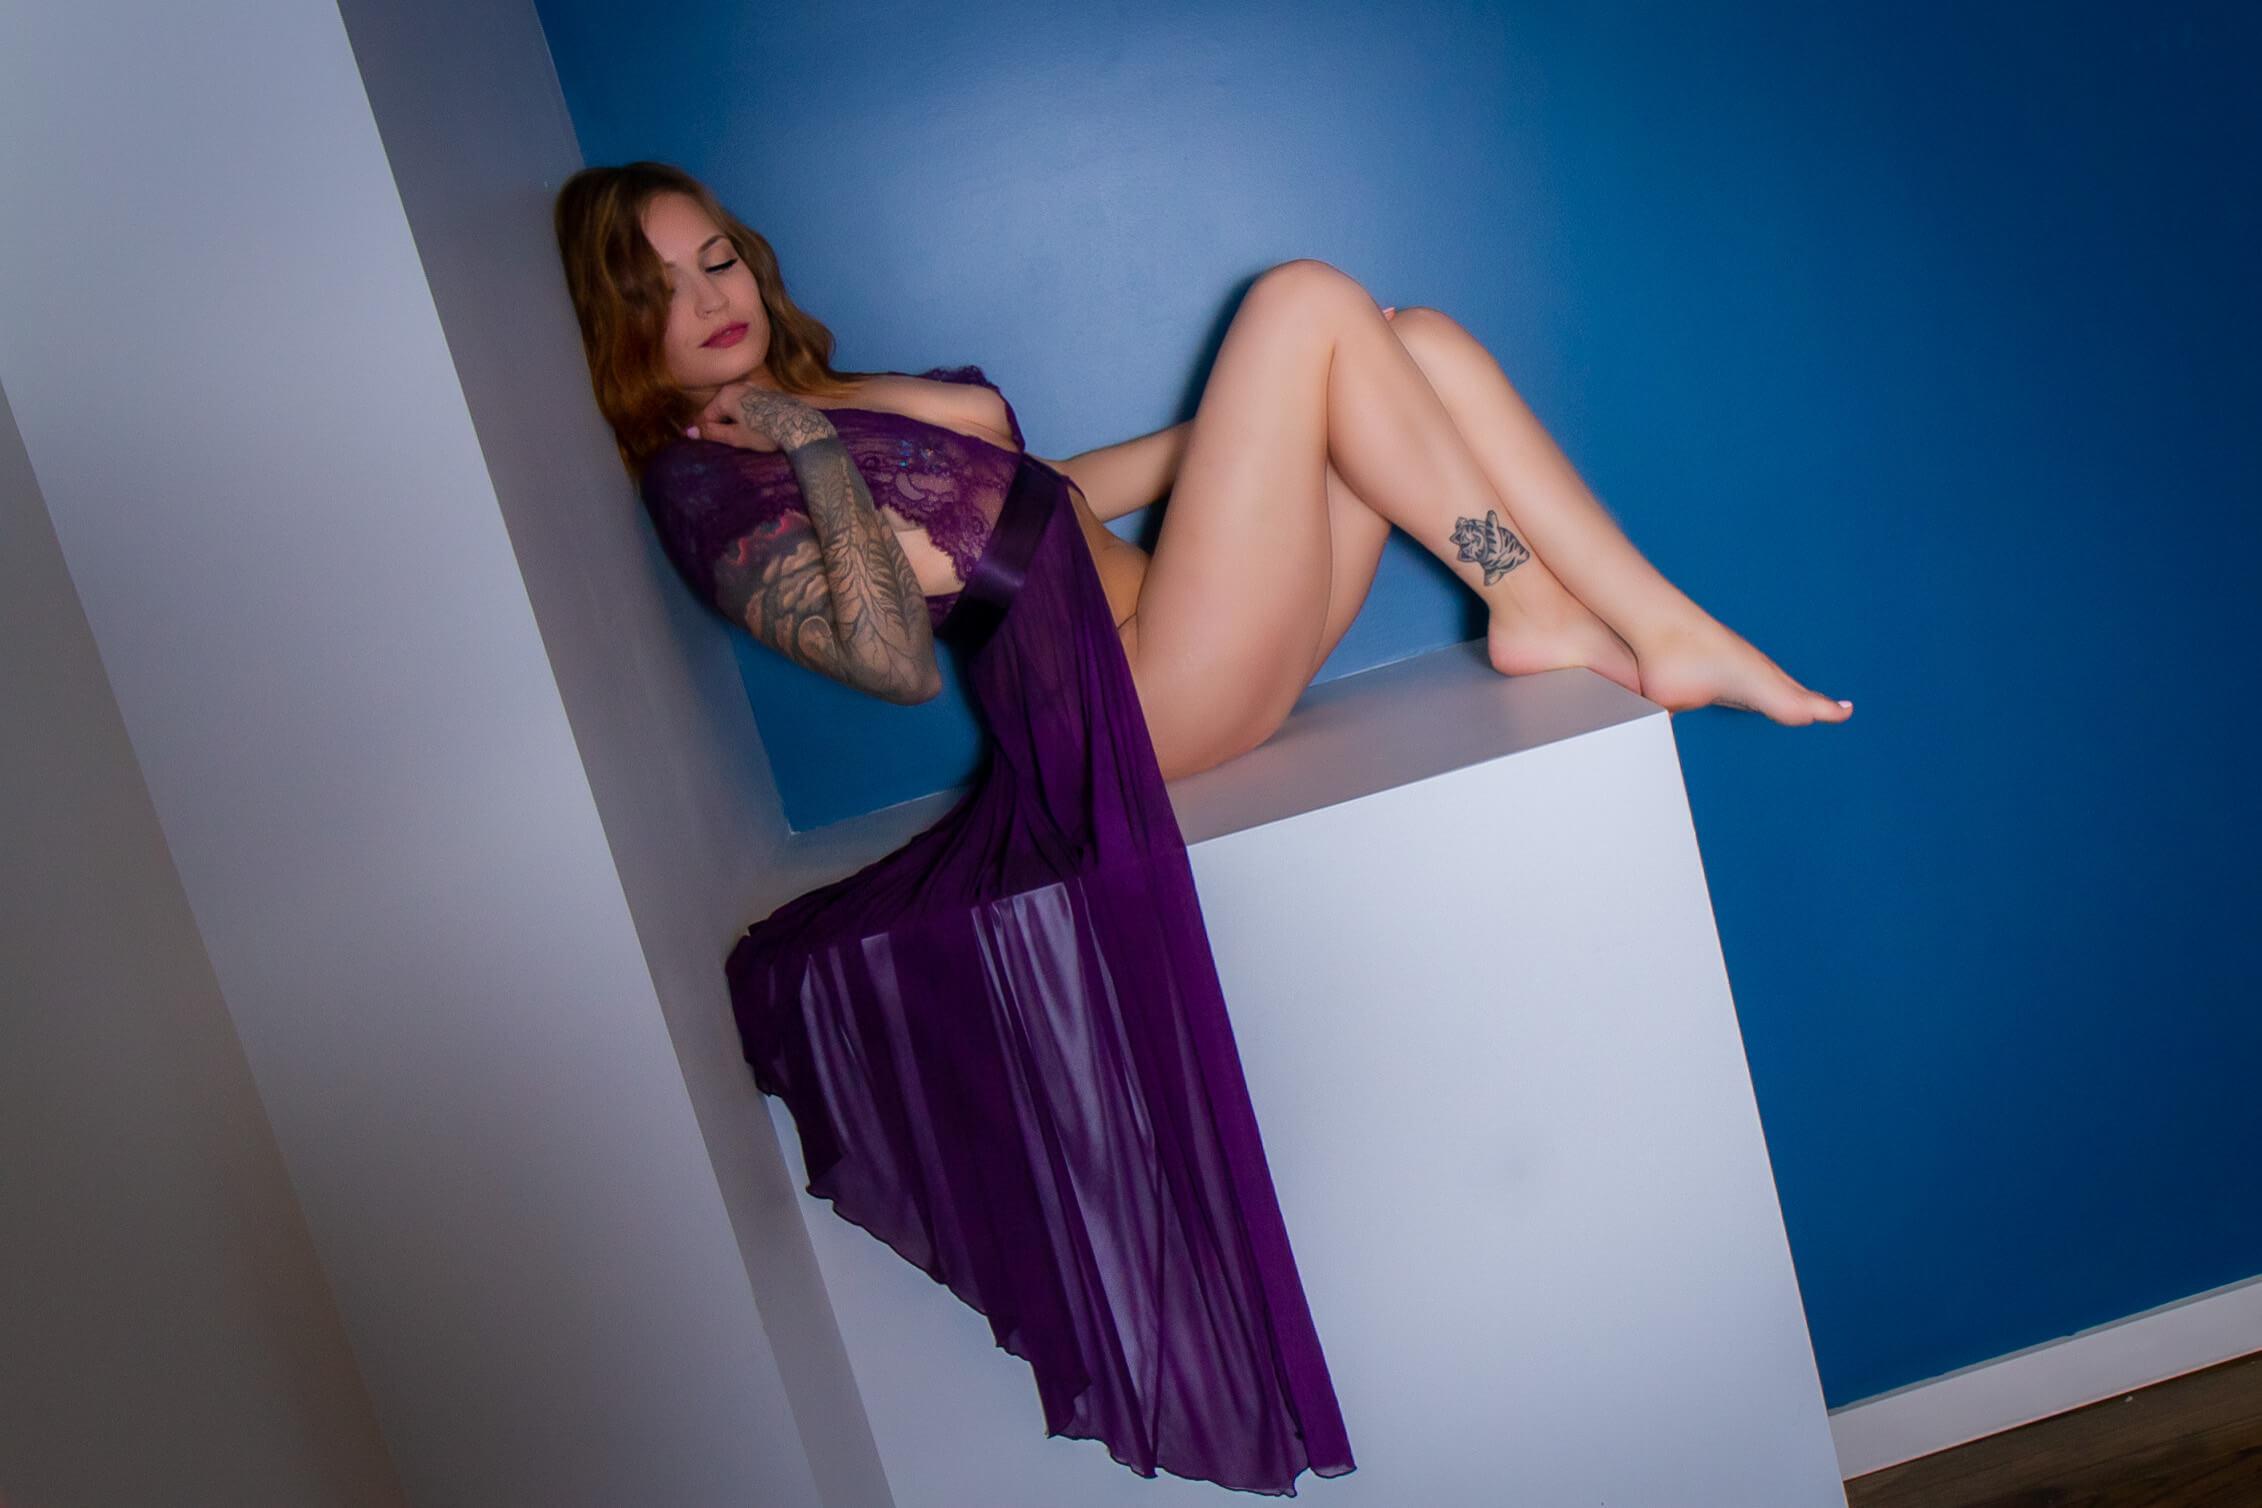 Saskatoon boudoir a woman poses on a sturdy shelf, wearing a purple robe that drapes over the edge of the shelf